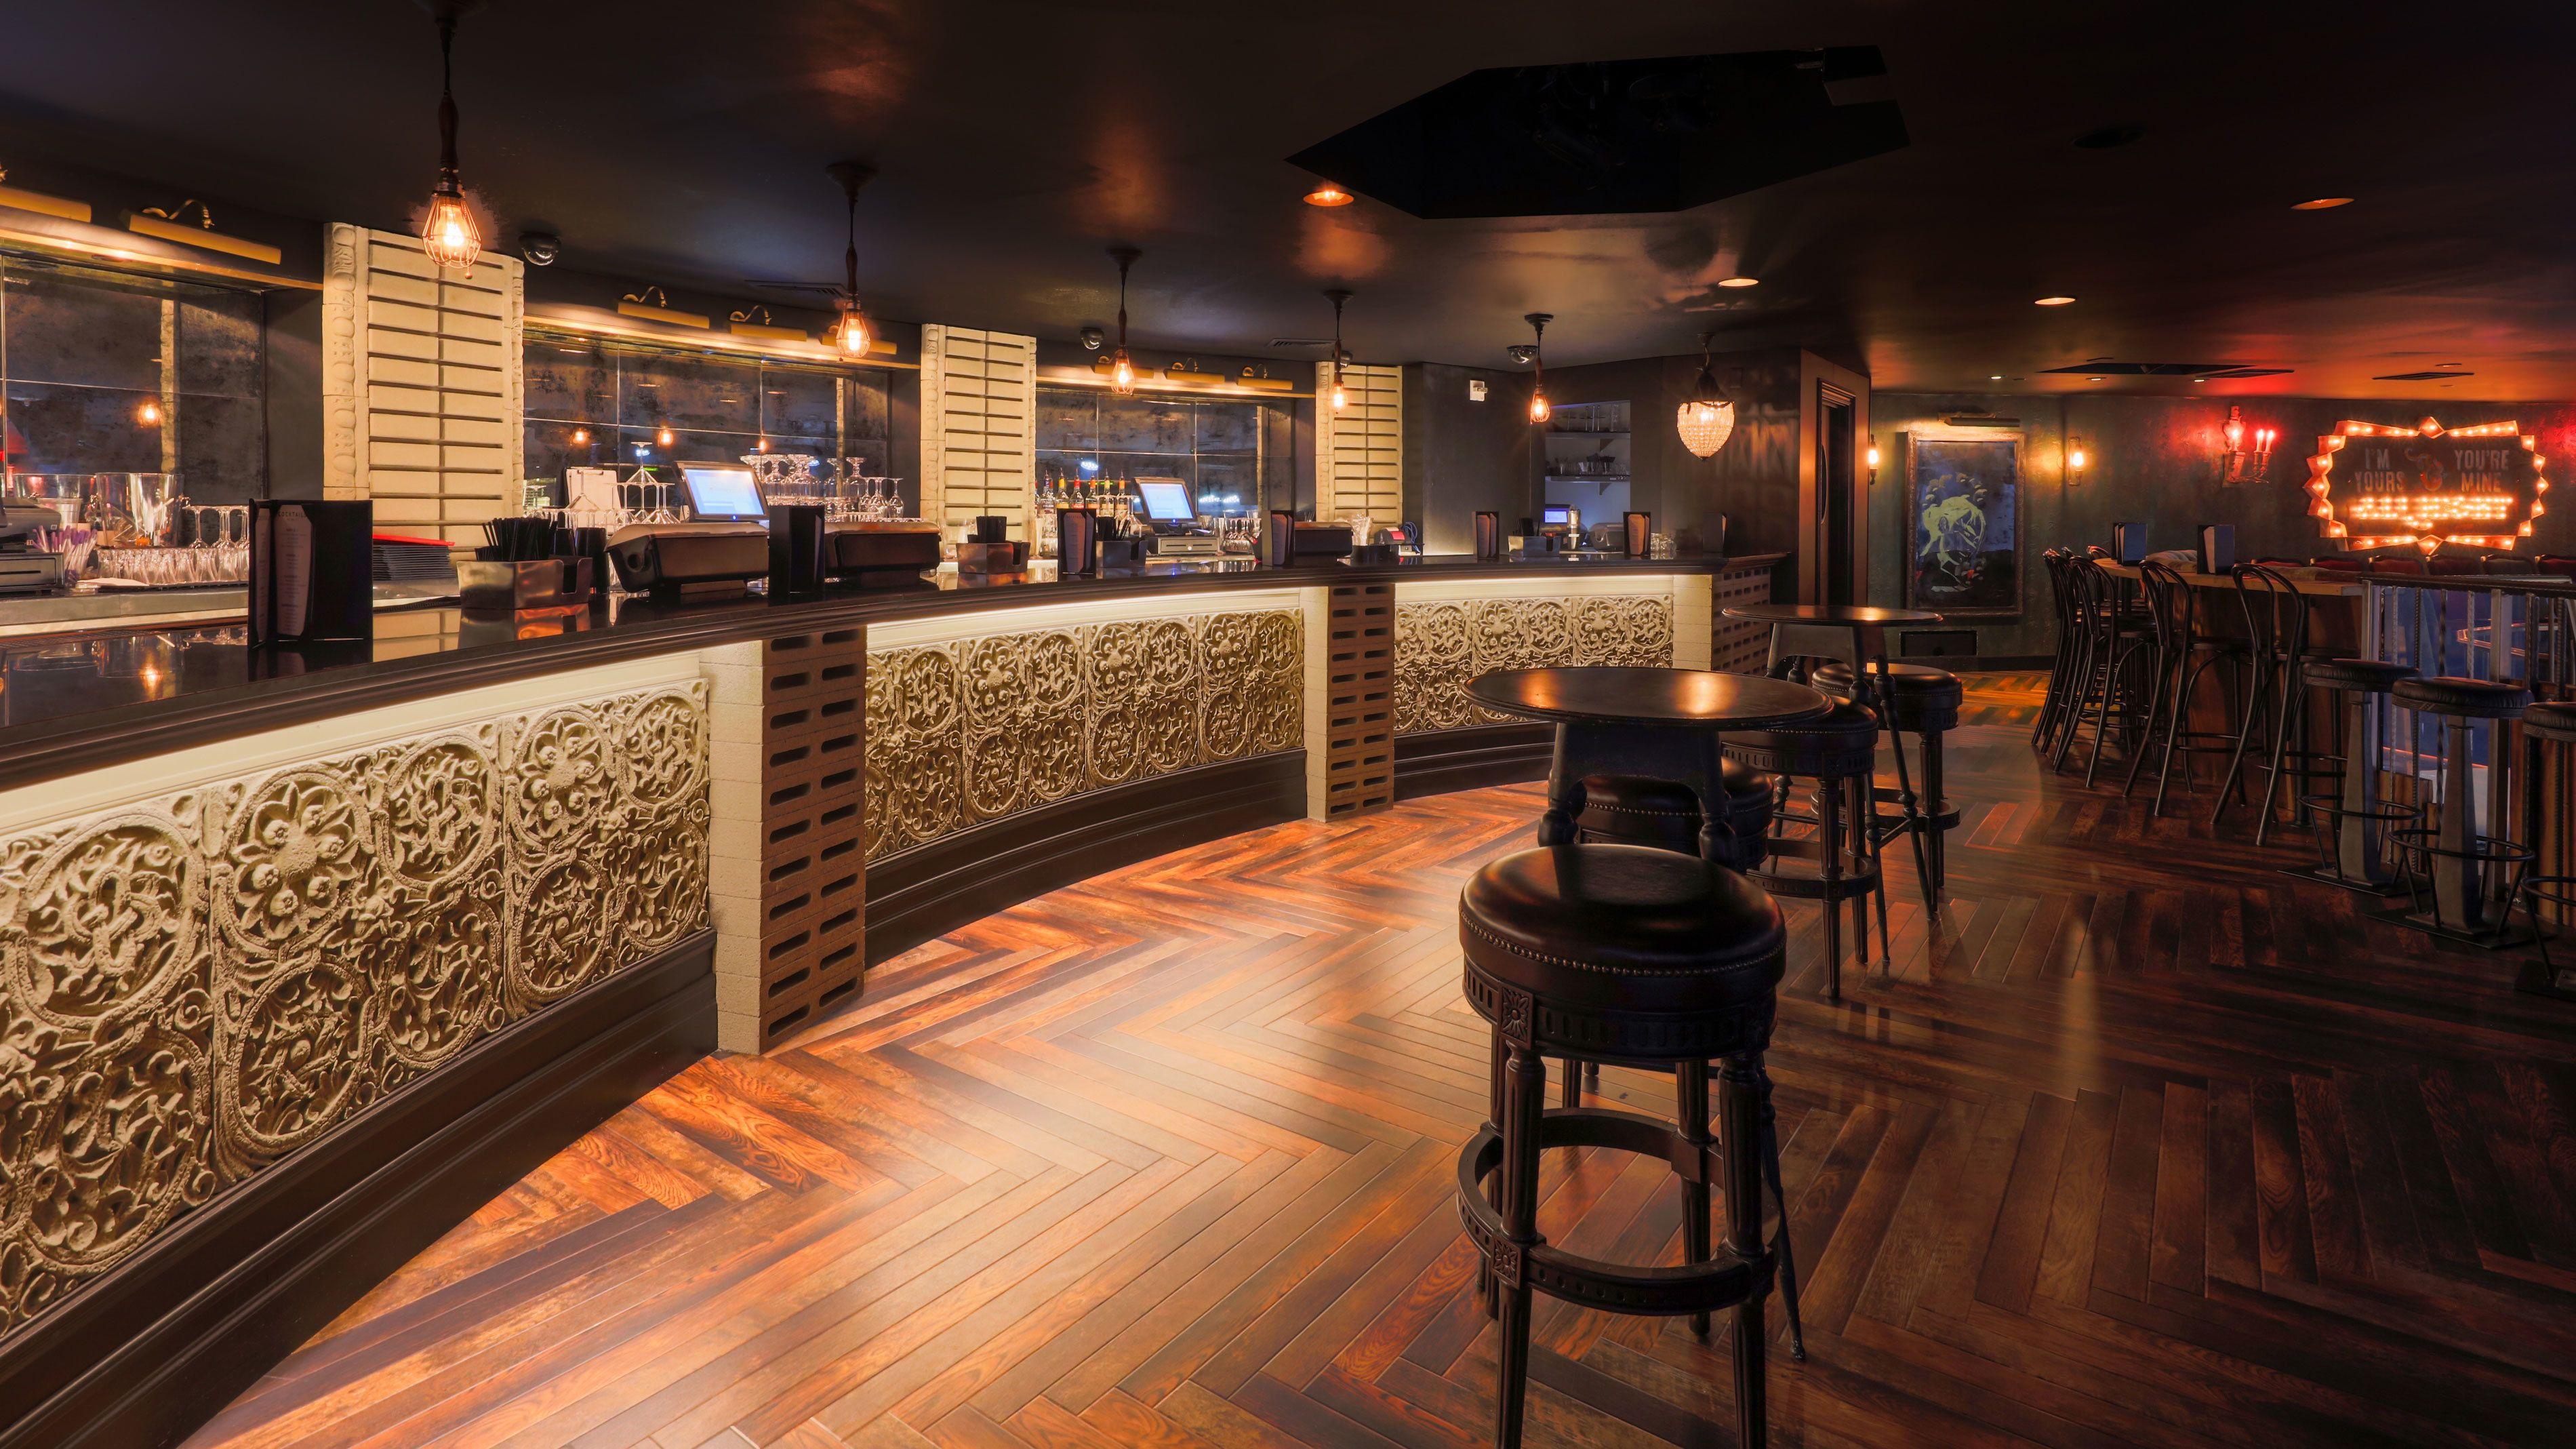 View of seating and bar at Hard Rock Hotel & Casino Las Vegas